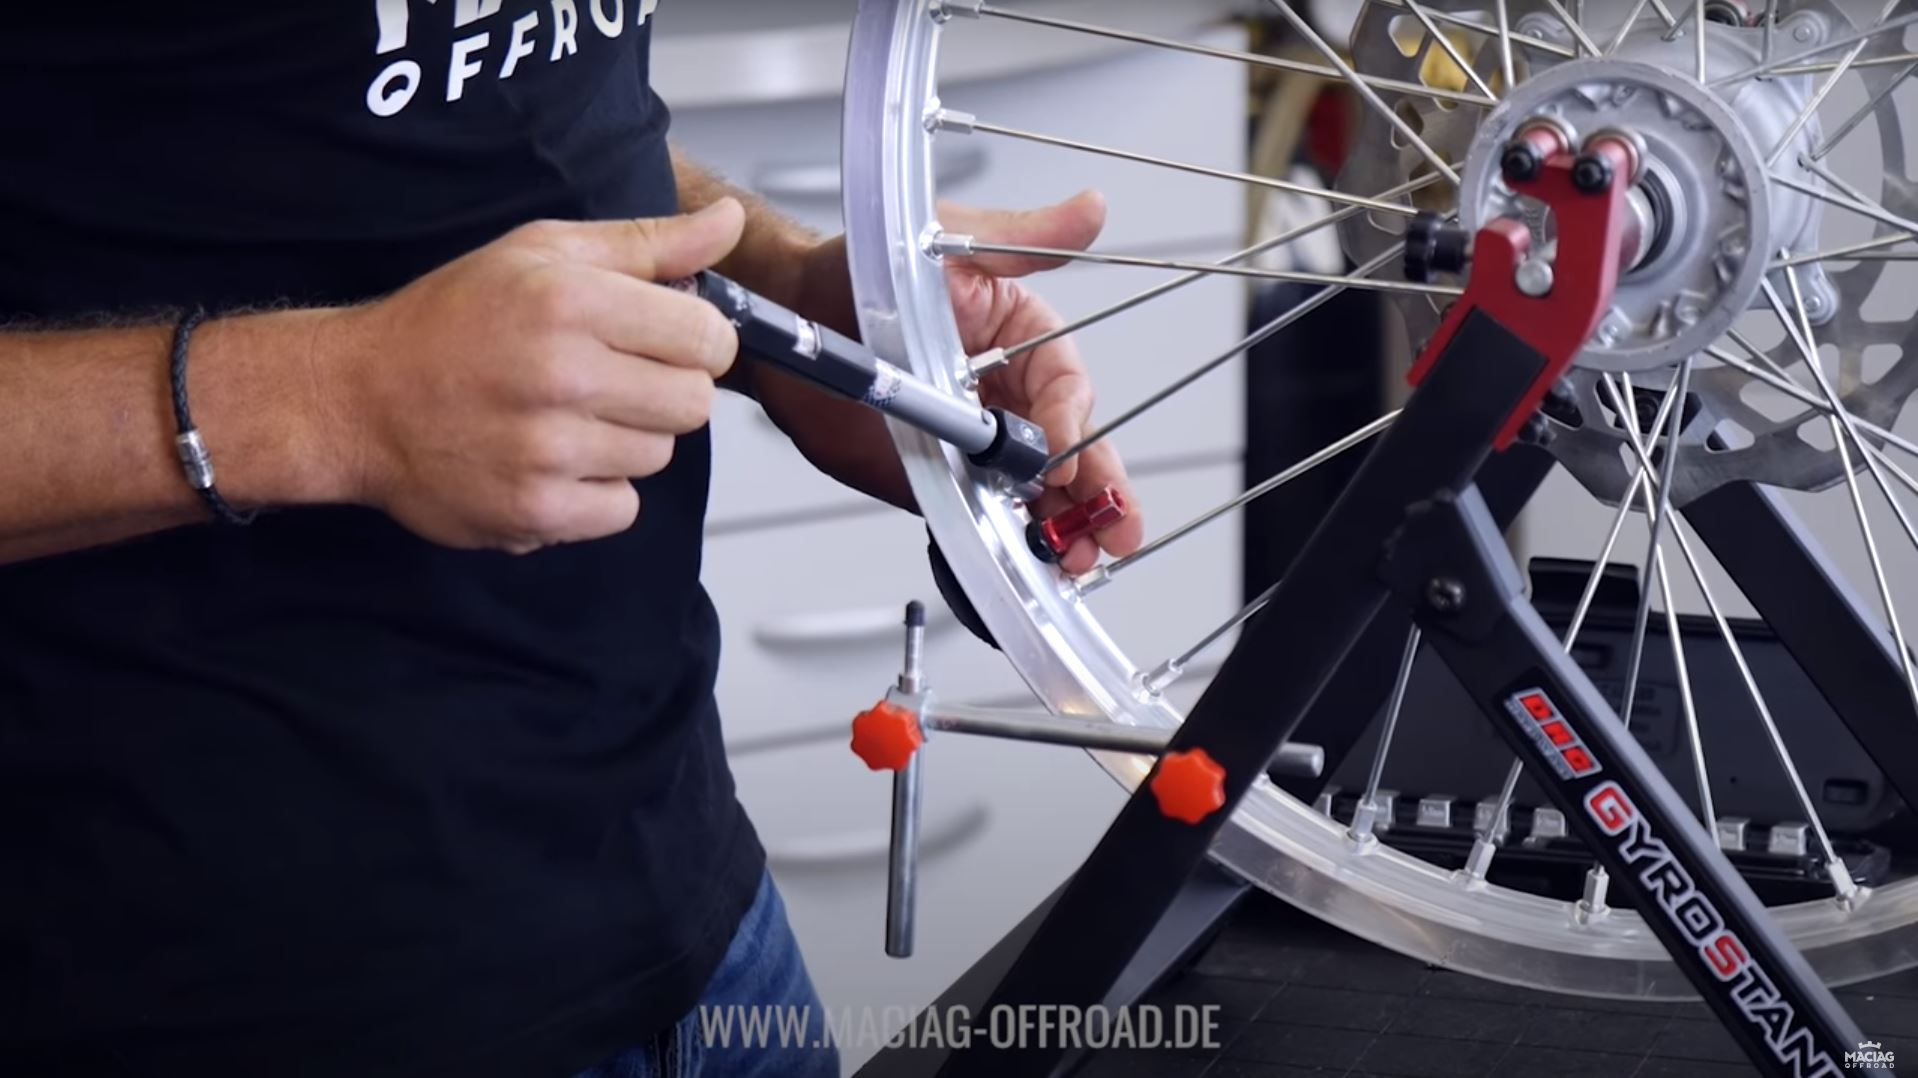 Wheel spoke tension adjustment